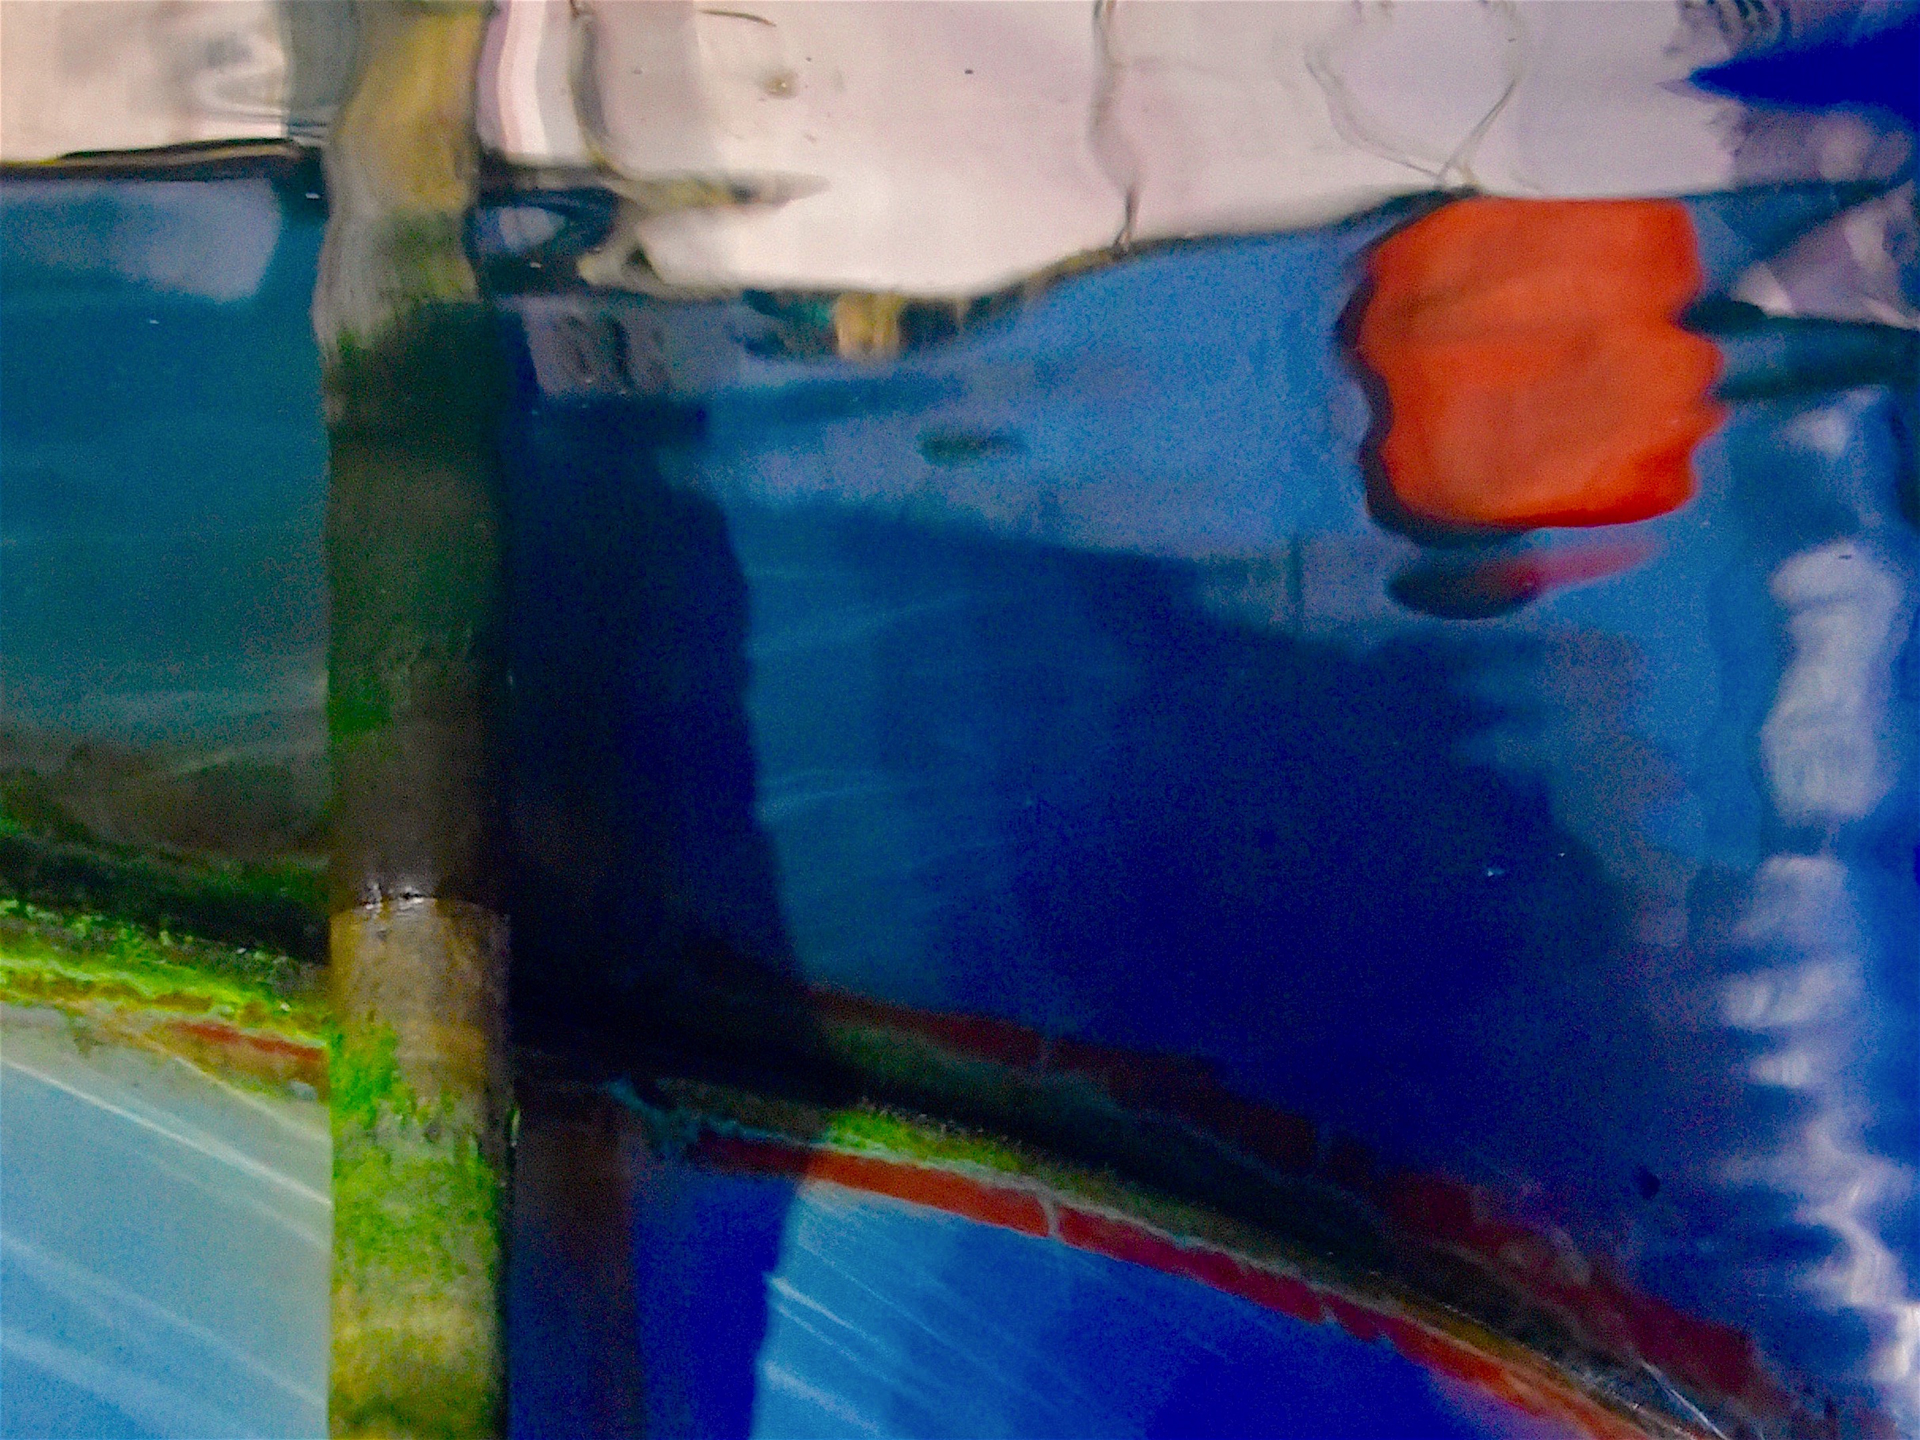 Montauk Reflections #20 by Kat O'Neill